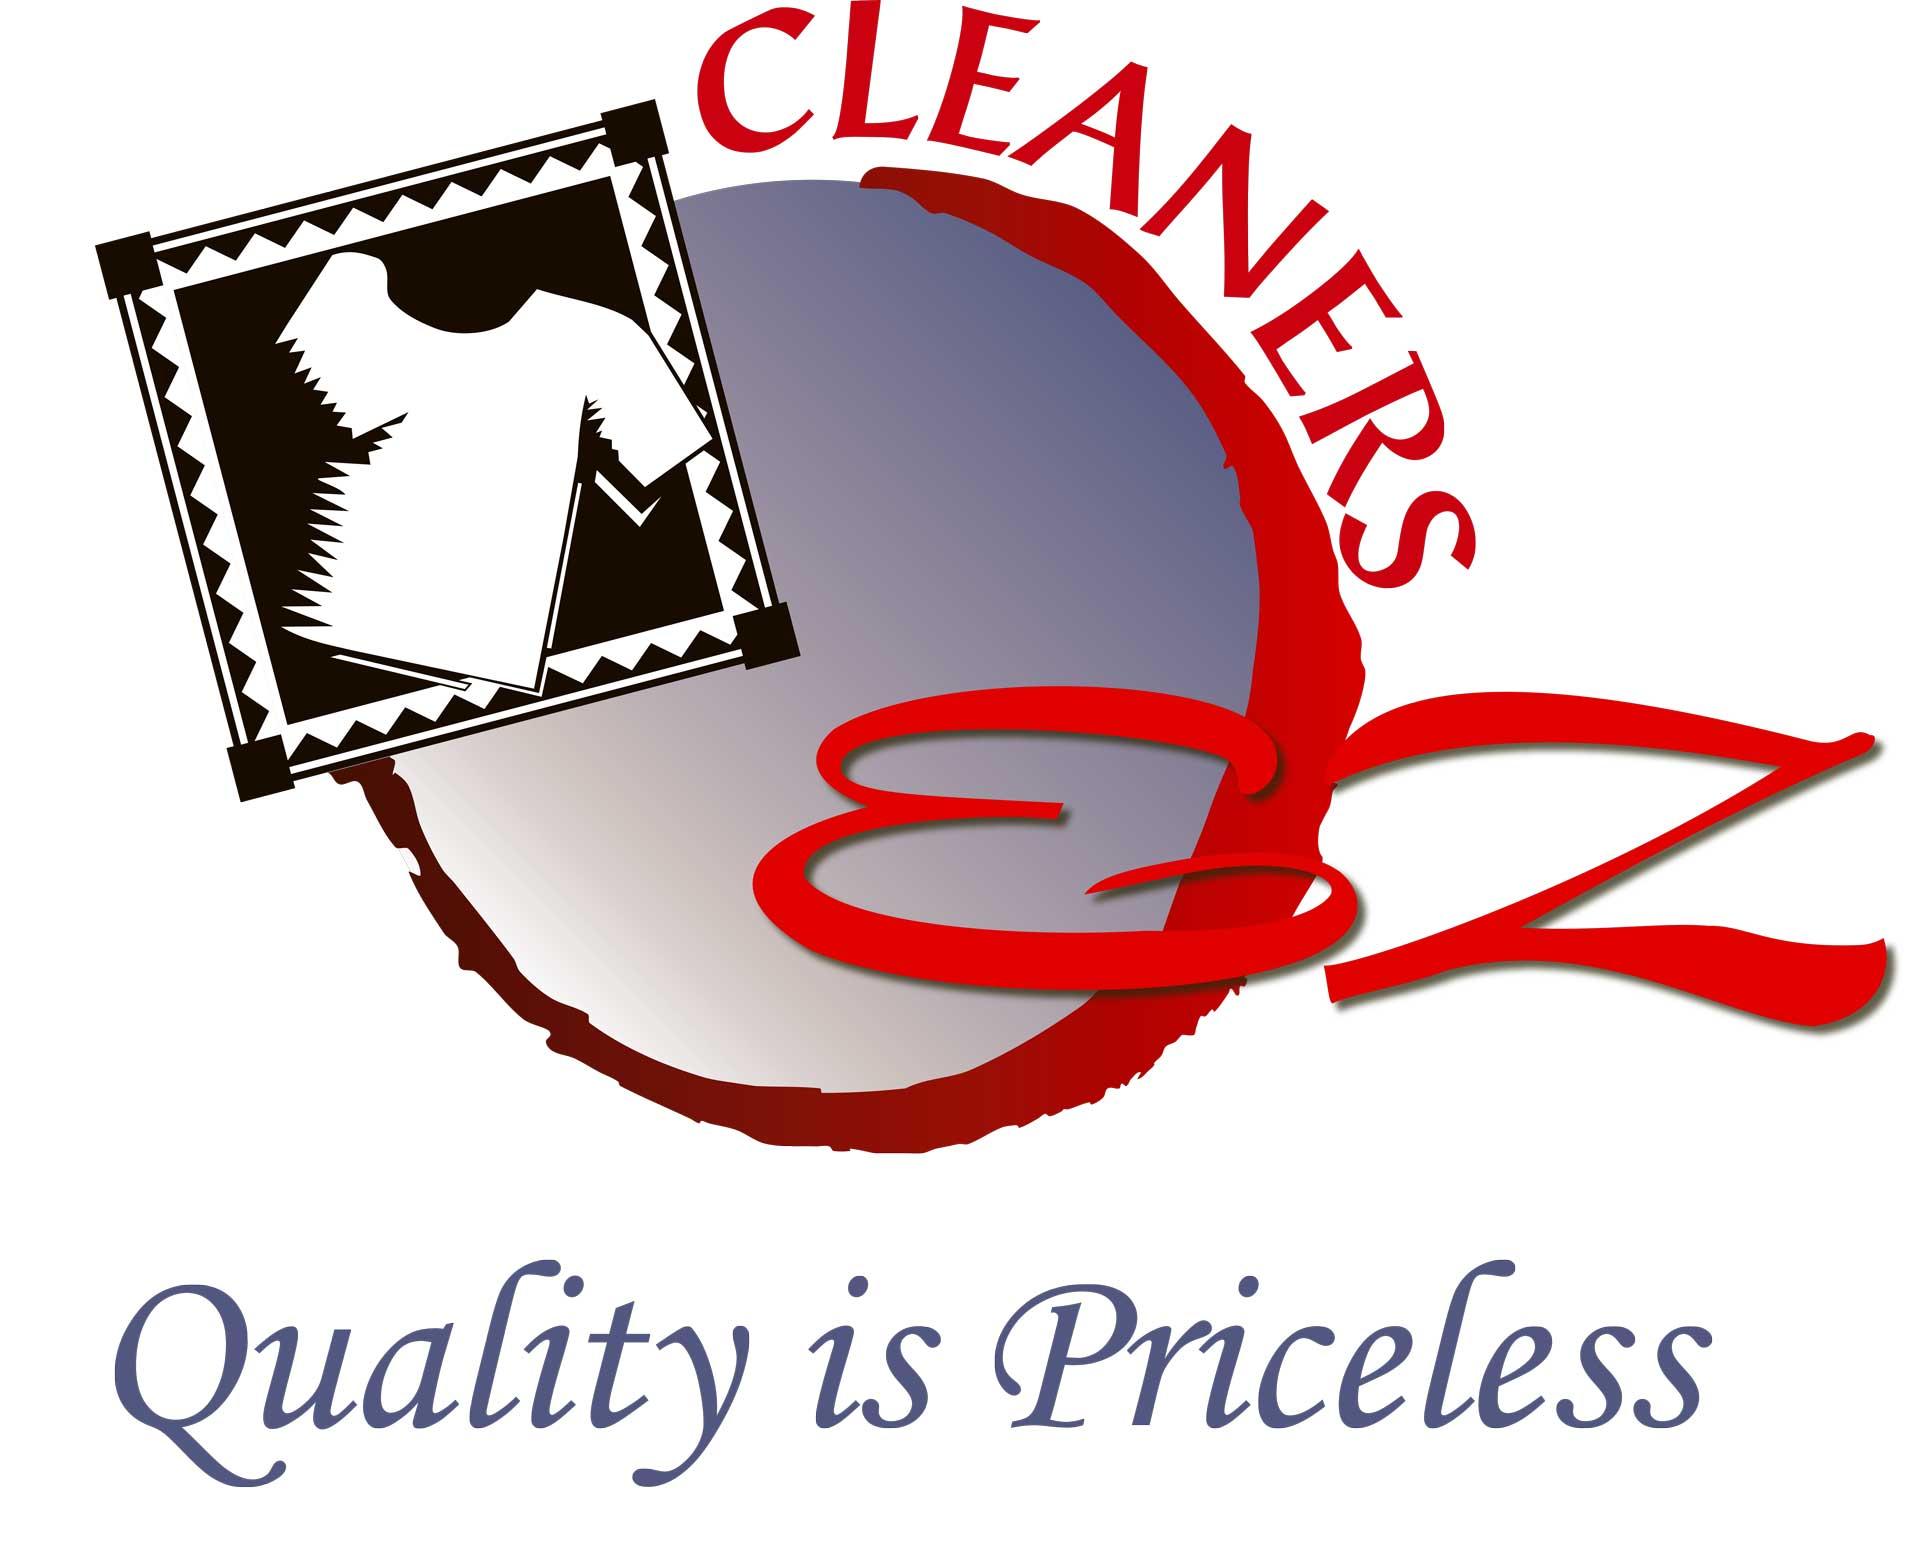 EZ Cleaners